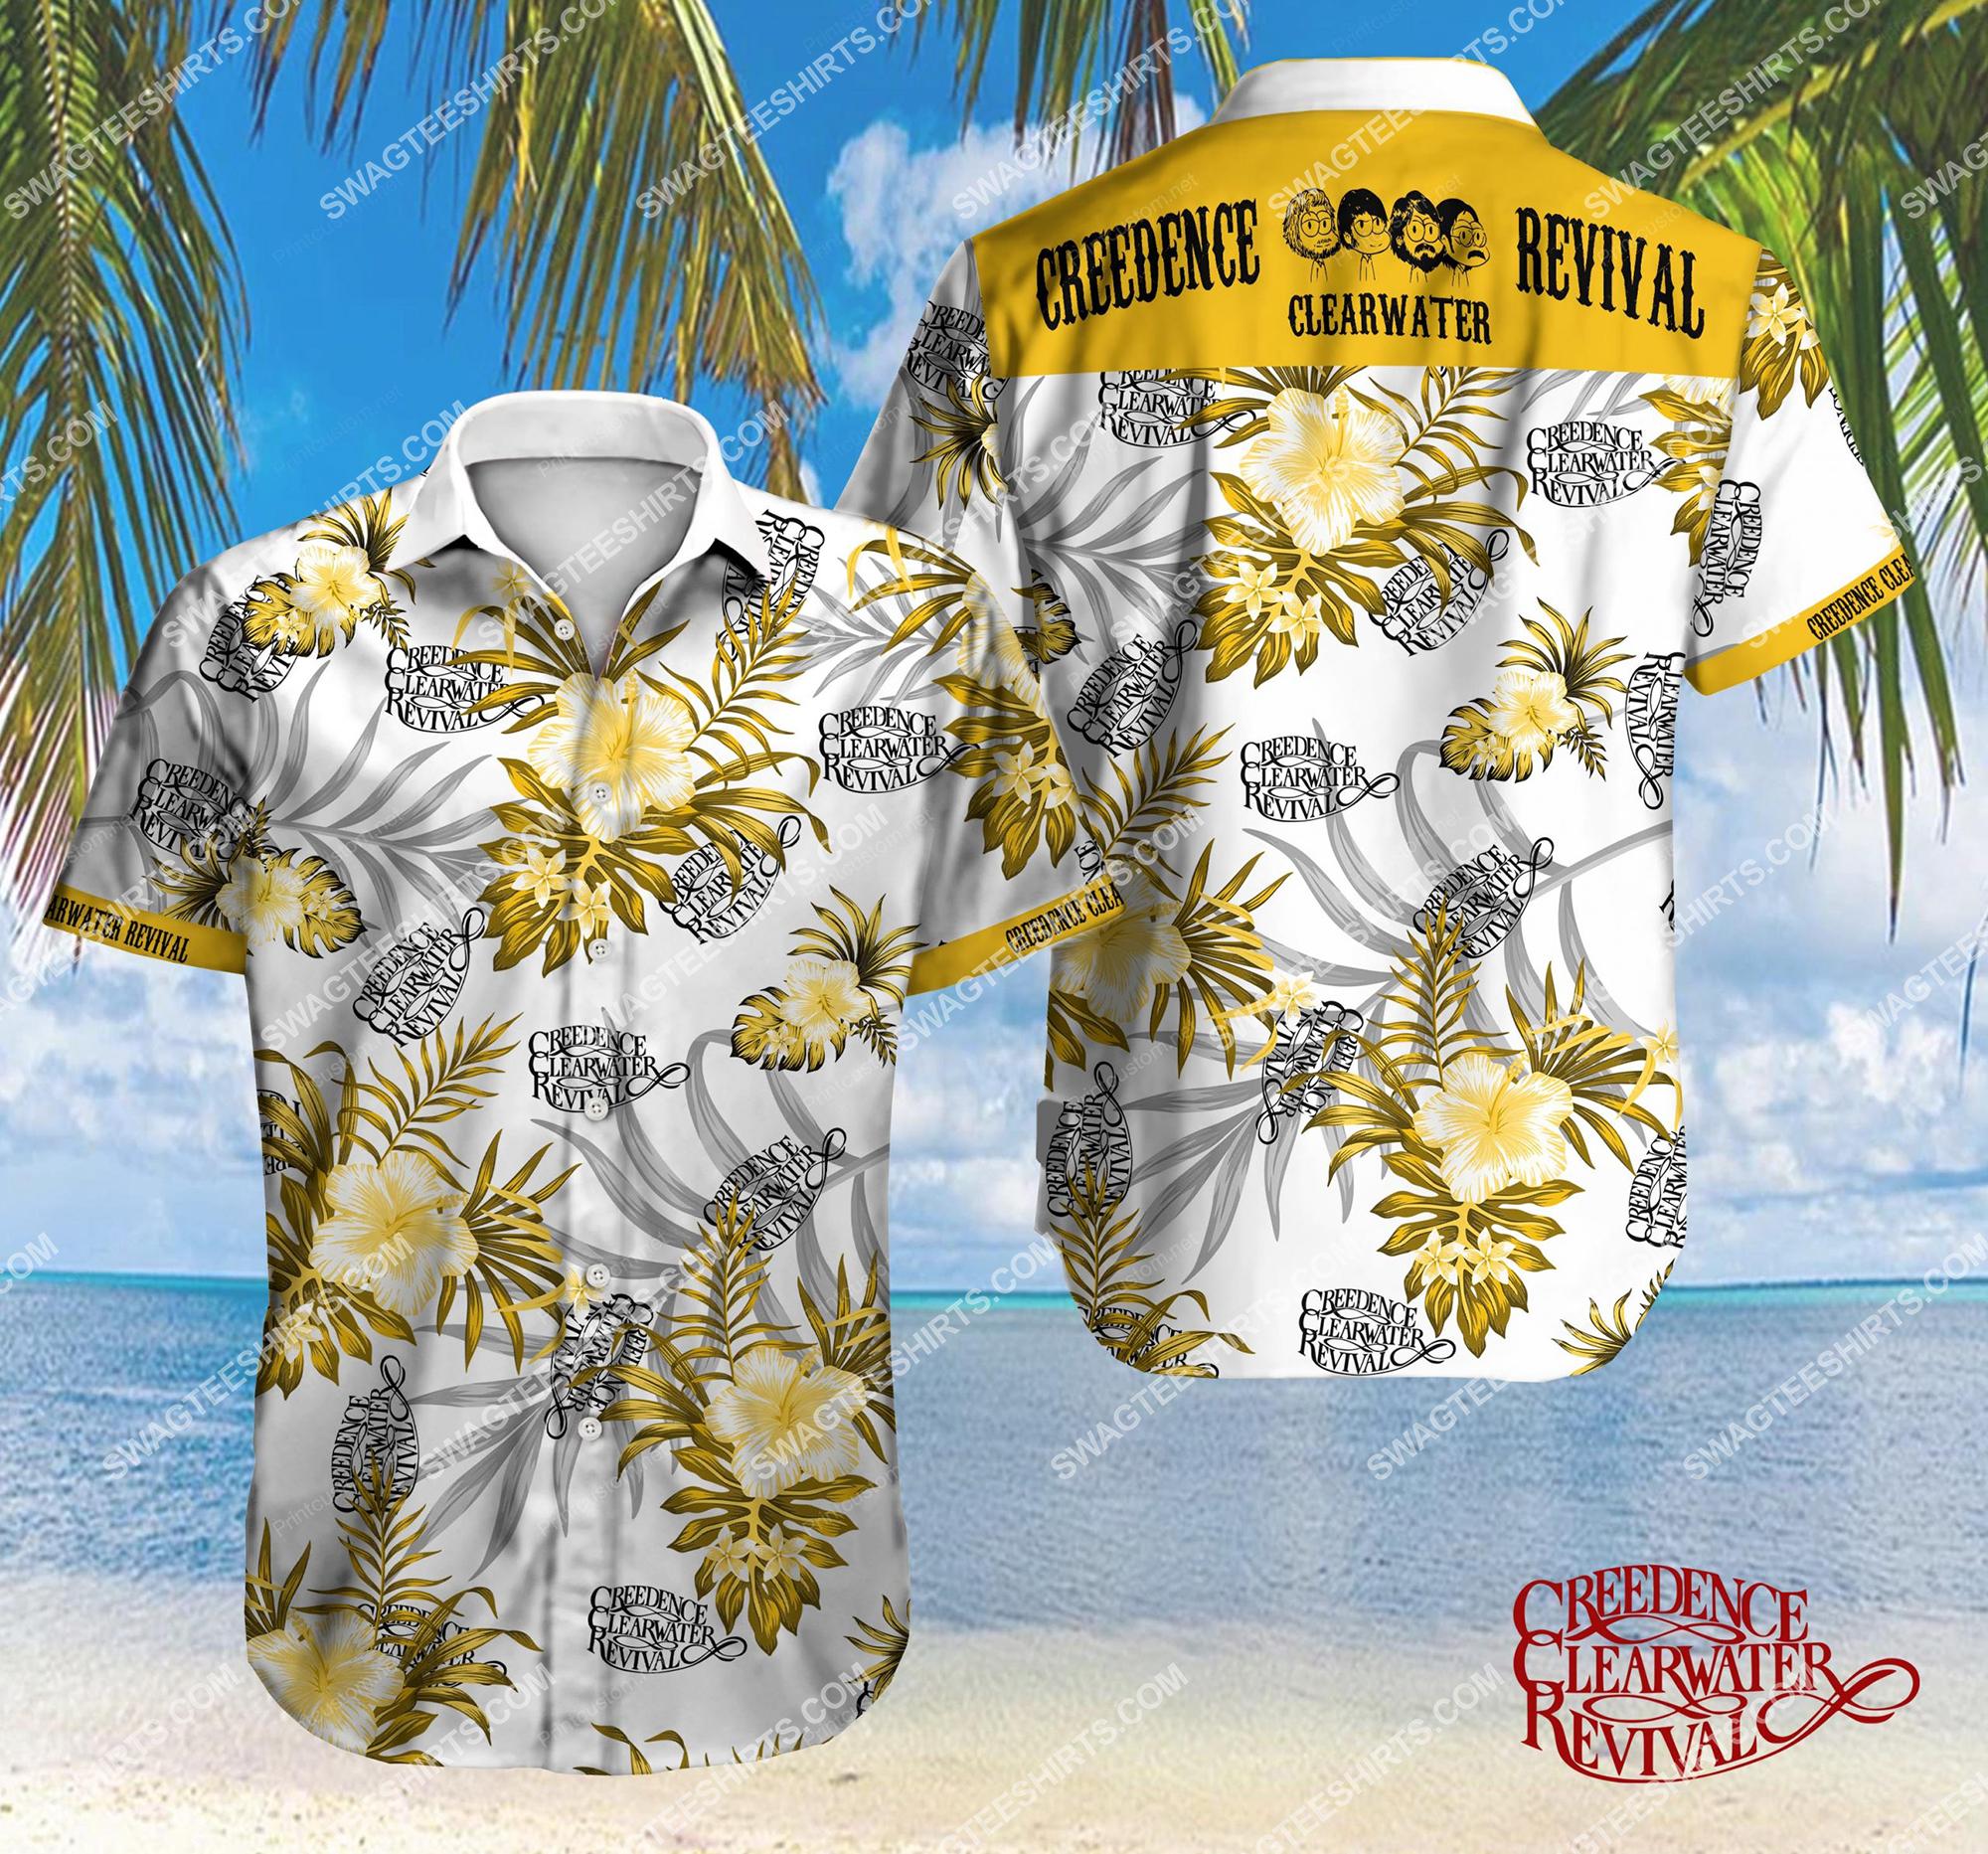 the creedence clearwater revival full printing hawaiian shirt 2